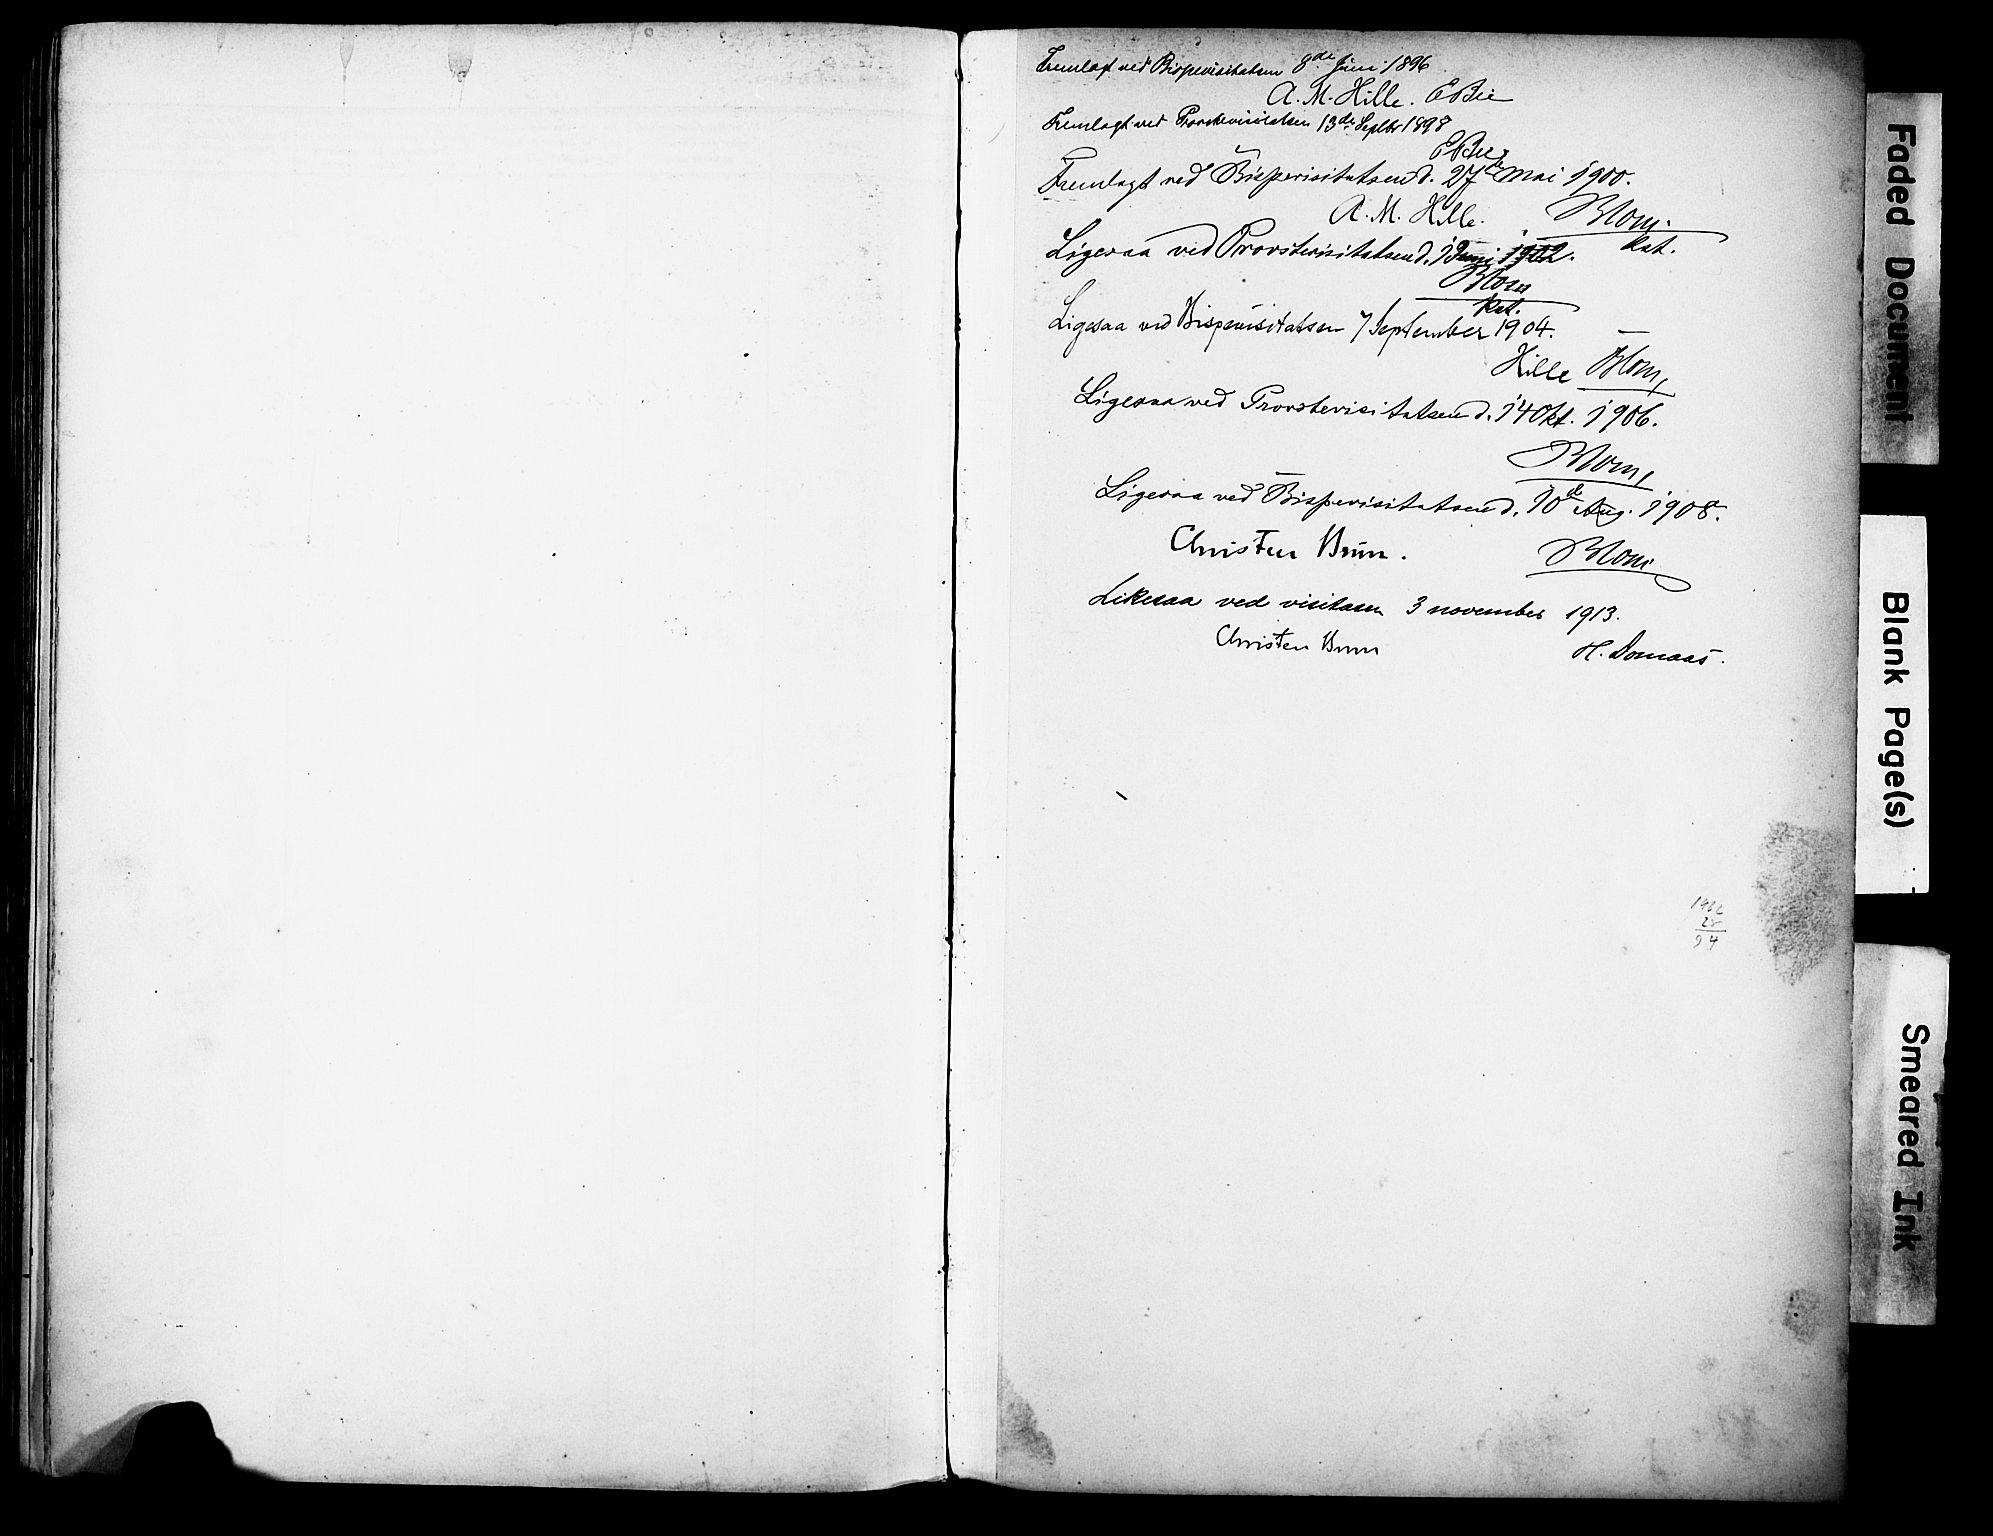 SAH, Vestre Toten prestekontor, H/Ha/Haa/L0013: Ministerialbok nr. 13, 1895-1911